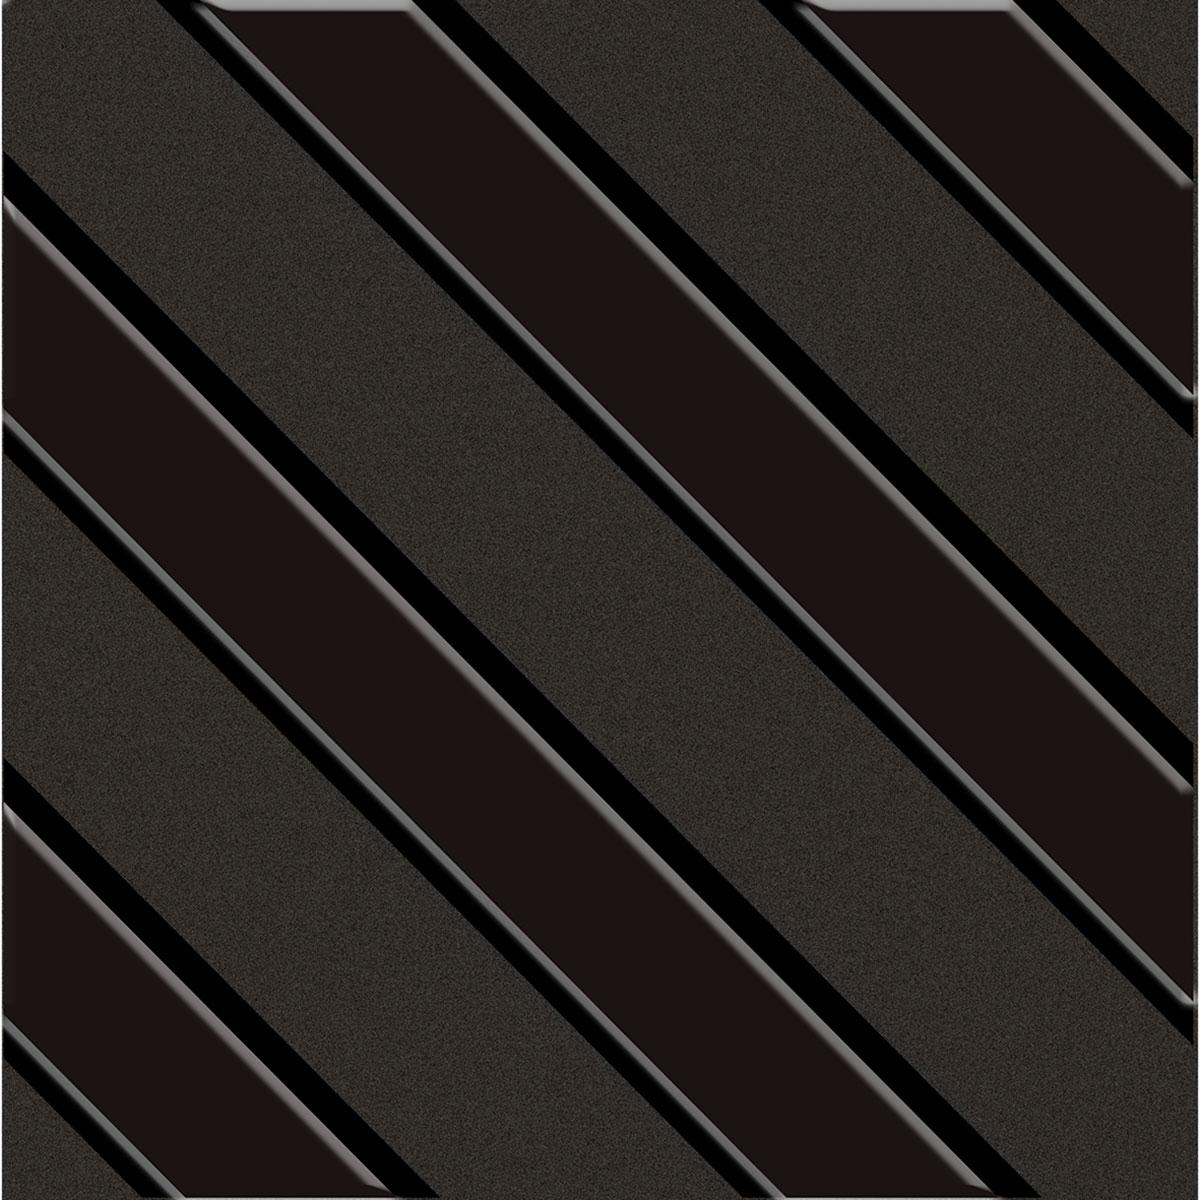 Signorino: 6. Black on Black